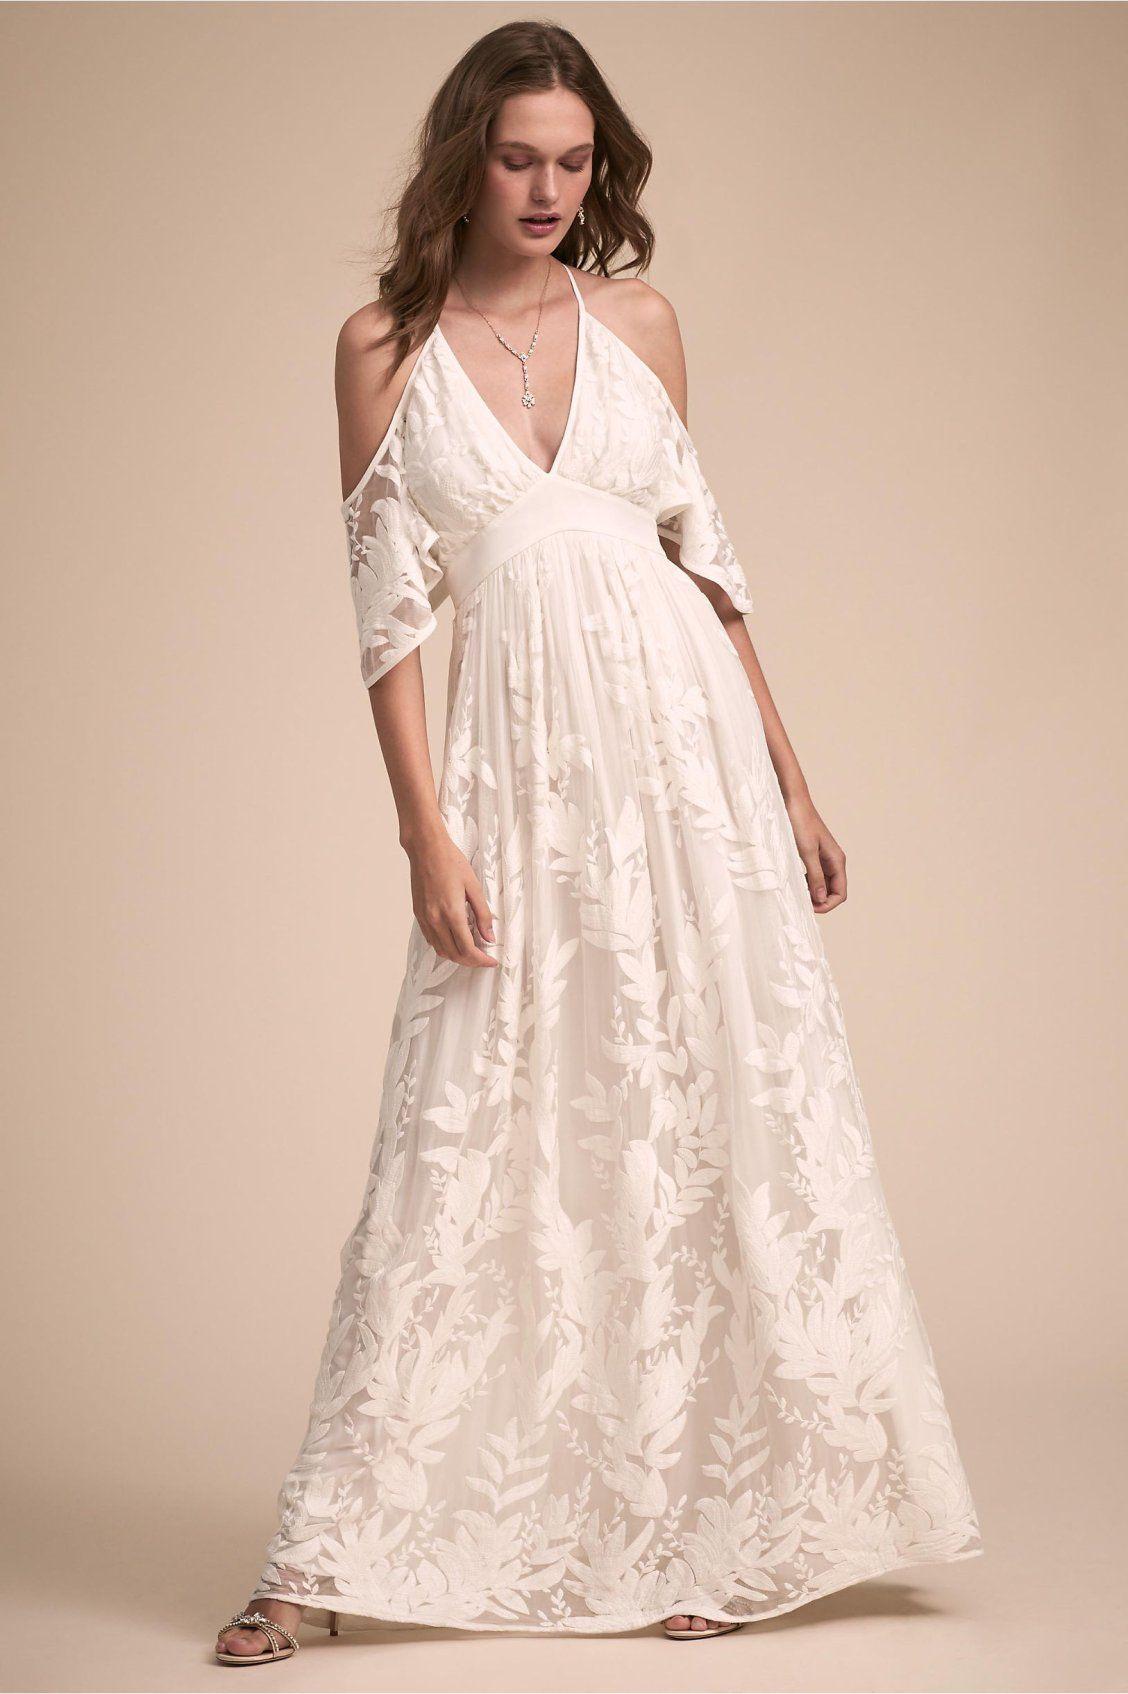 Wylie Dress From Bhldn Stunning Dresses A Line Wedding Dress Cold Shoulder Wedding Dress